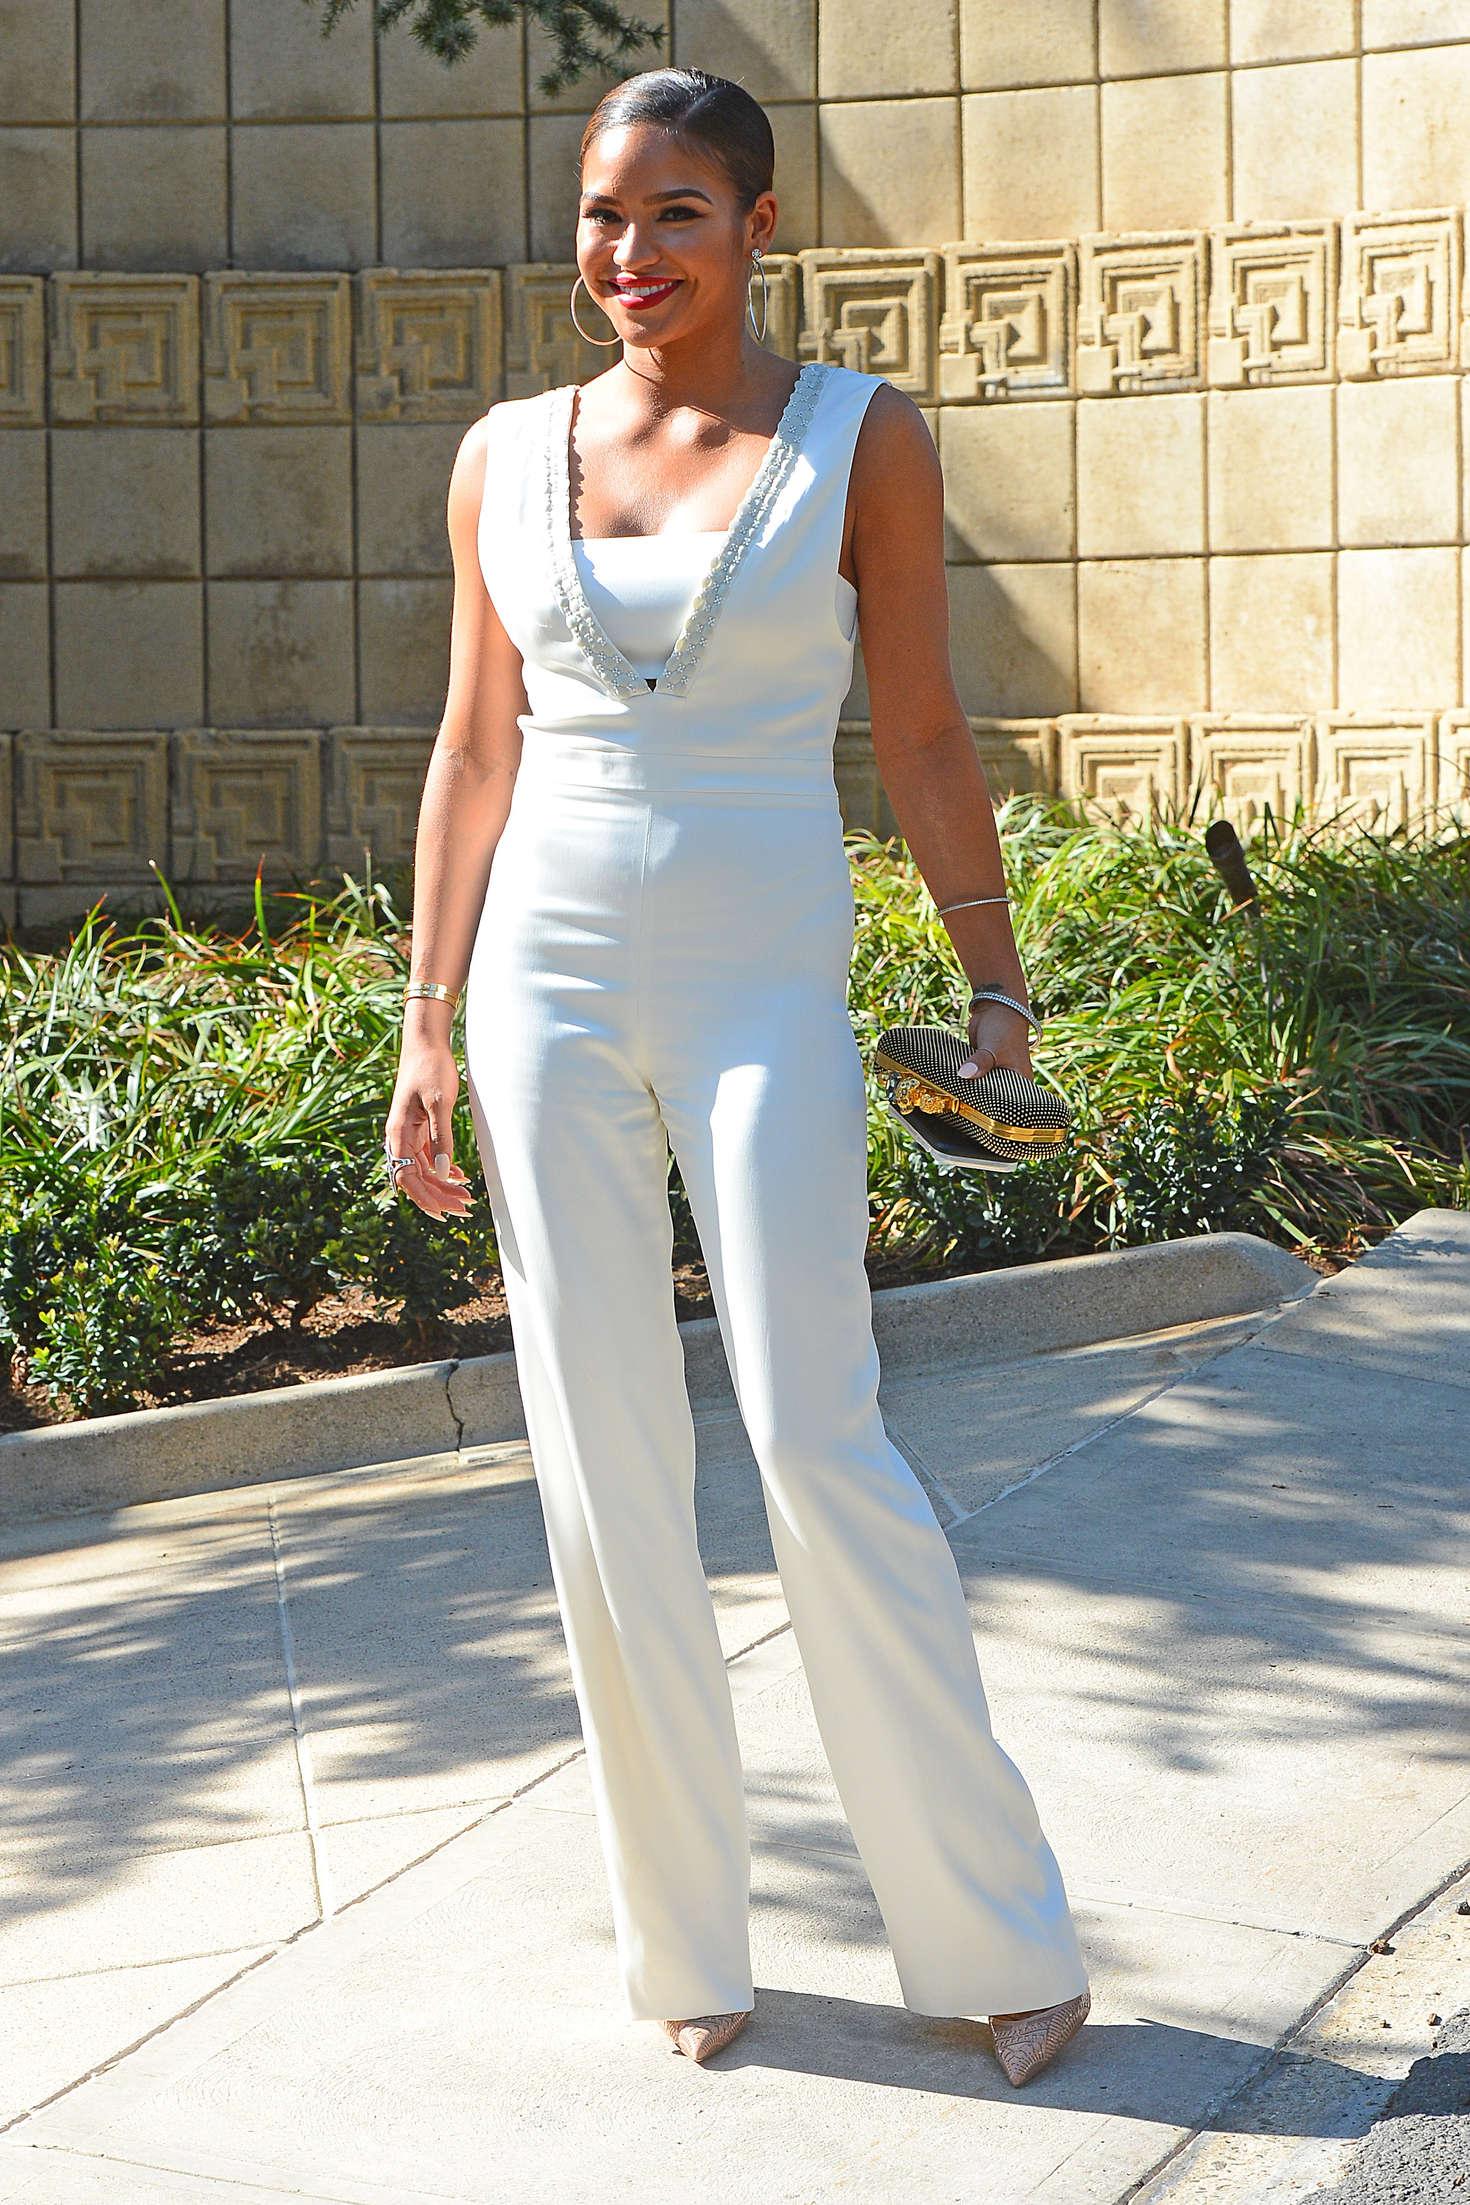 Cassie Ventura Attends the M.A.C Cosmetics Zac Posen Luncheon in Los Angeles